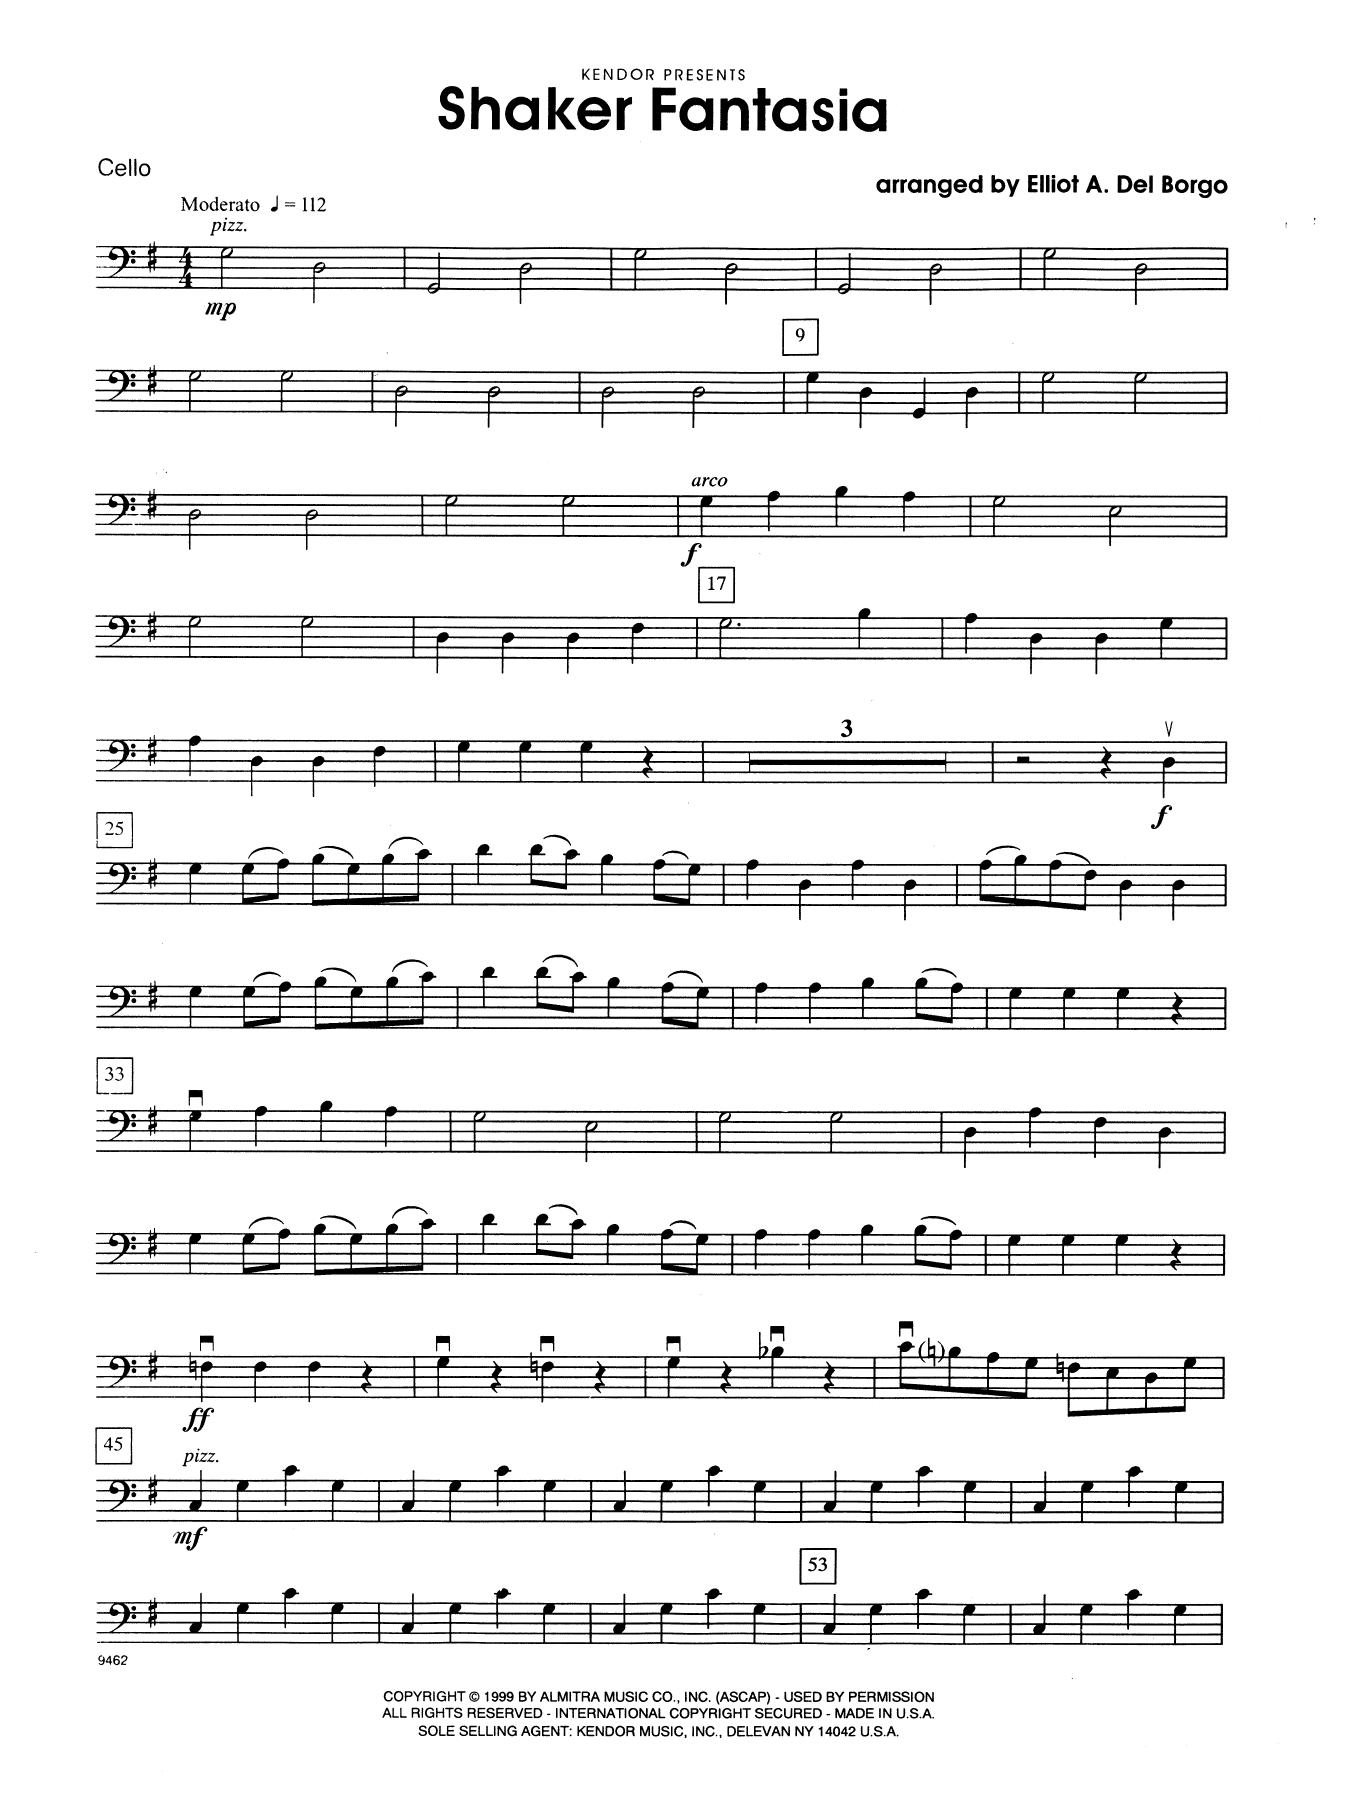 Elliot A. Del Borgo Shaker Fantasia - Cello sheet music notes and chords. Download Printable PDF.